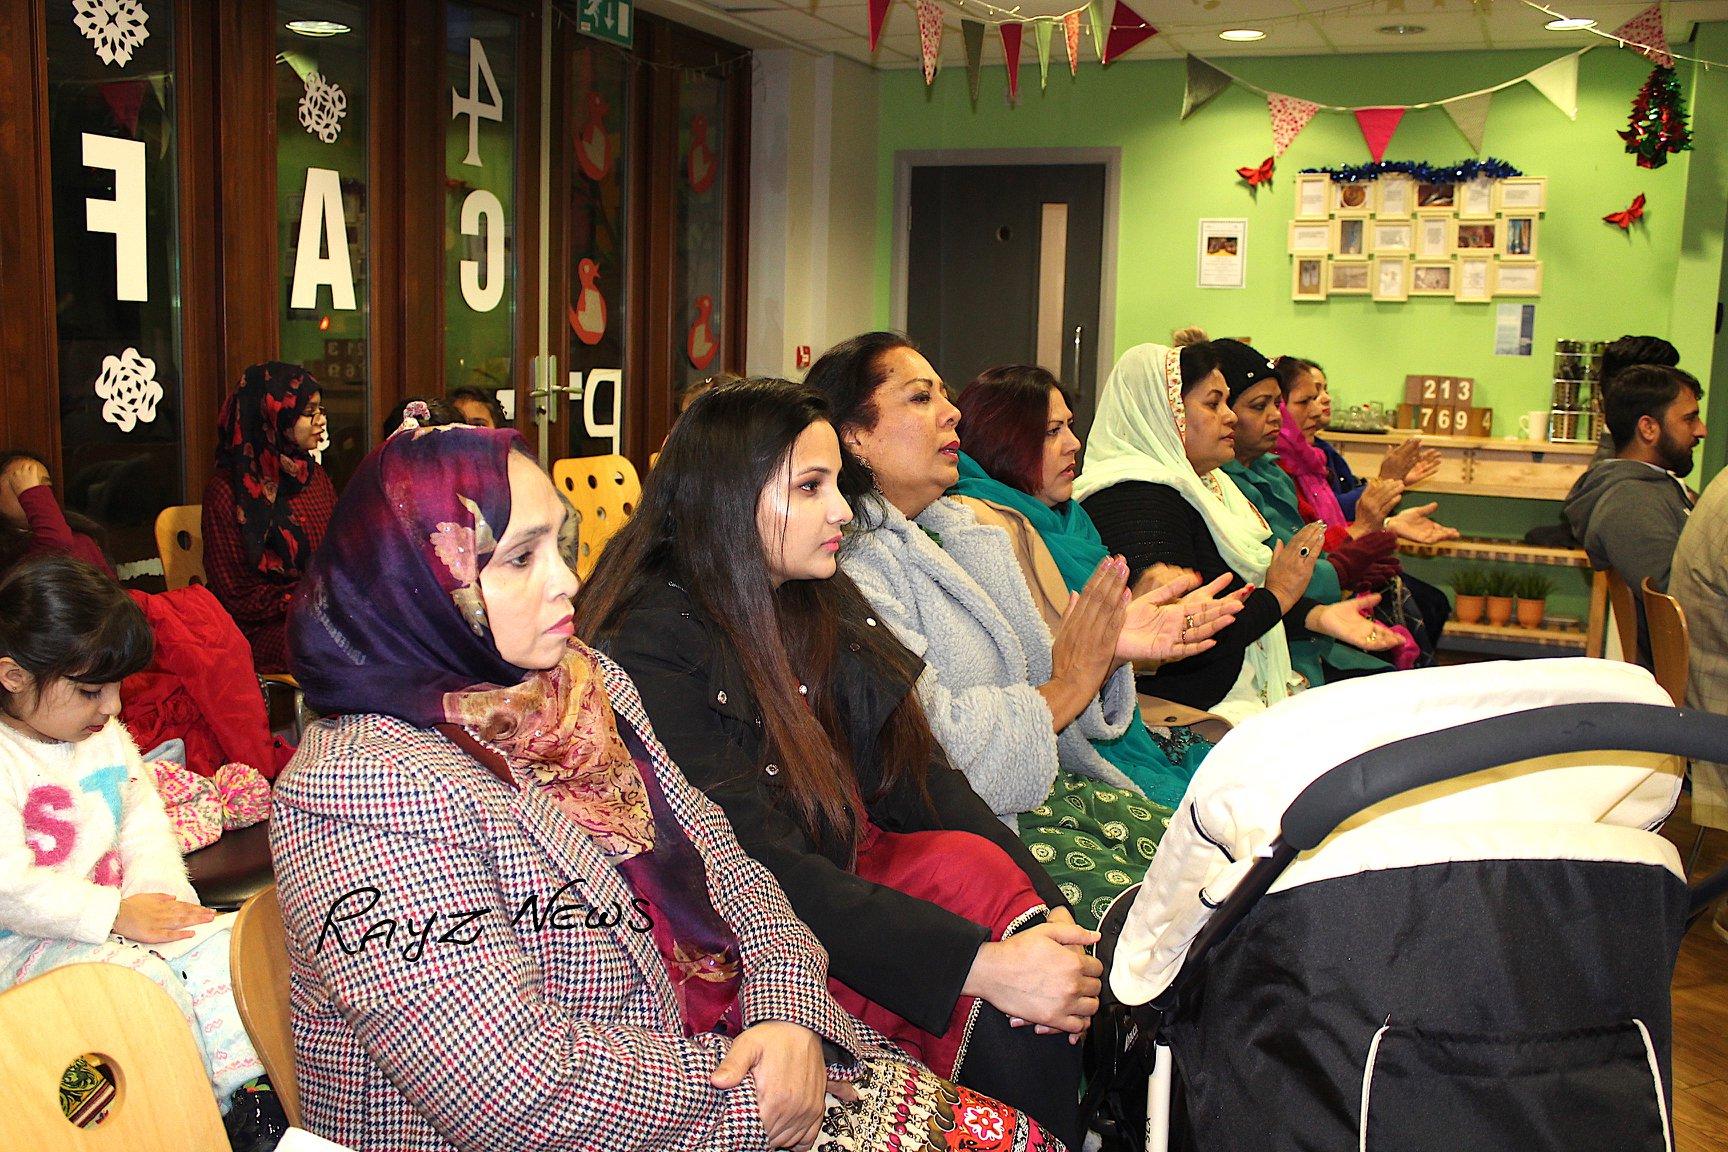 IHSSCM organised a Interfaith Christmas party